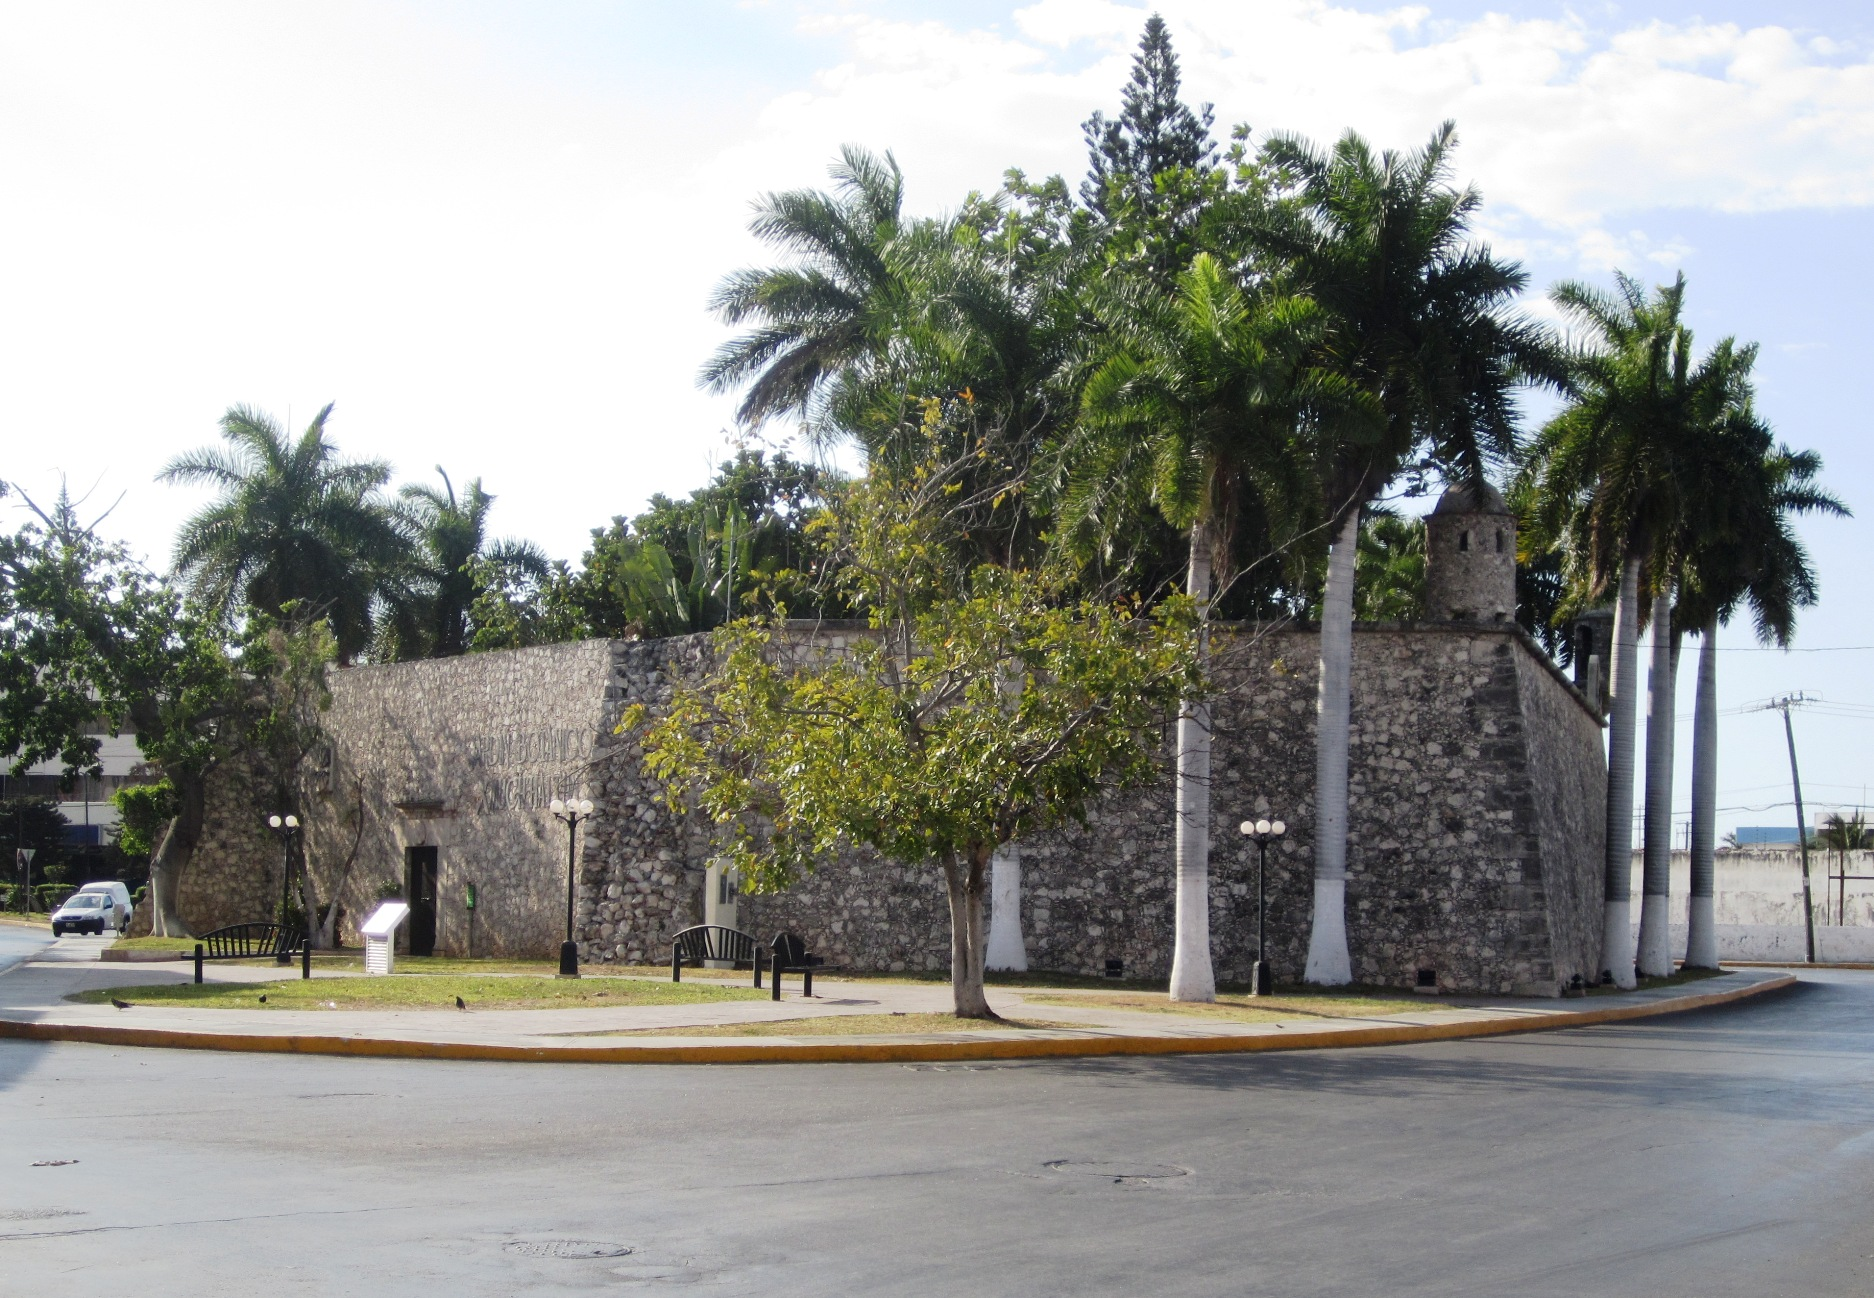 Baluarte de Santiago, de los baluartes de Campeche